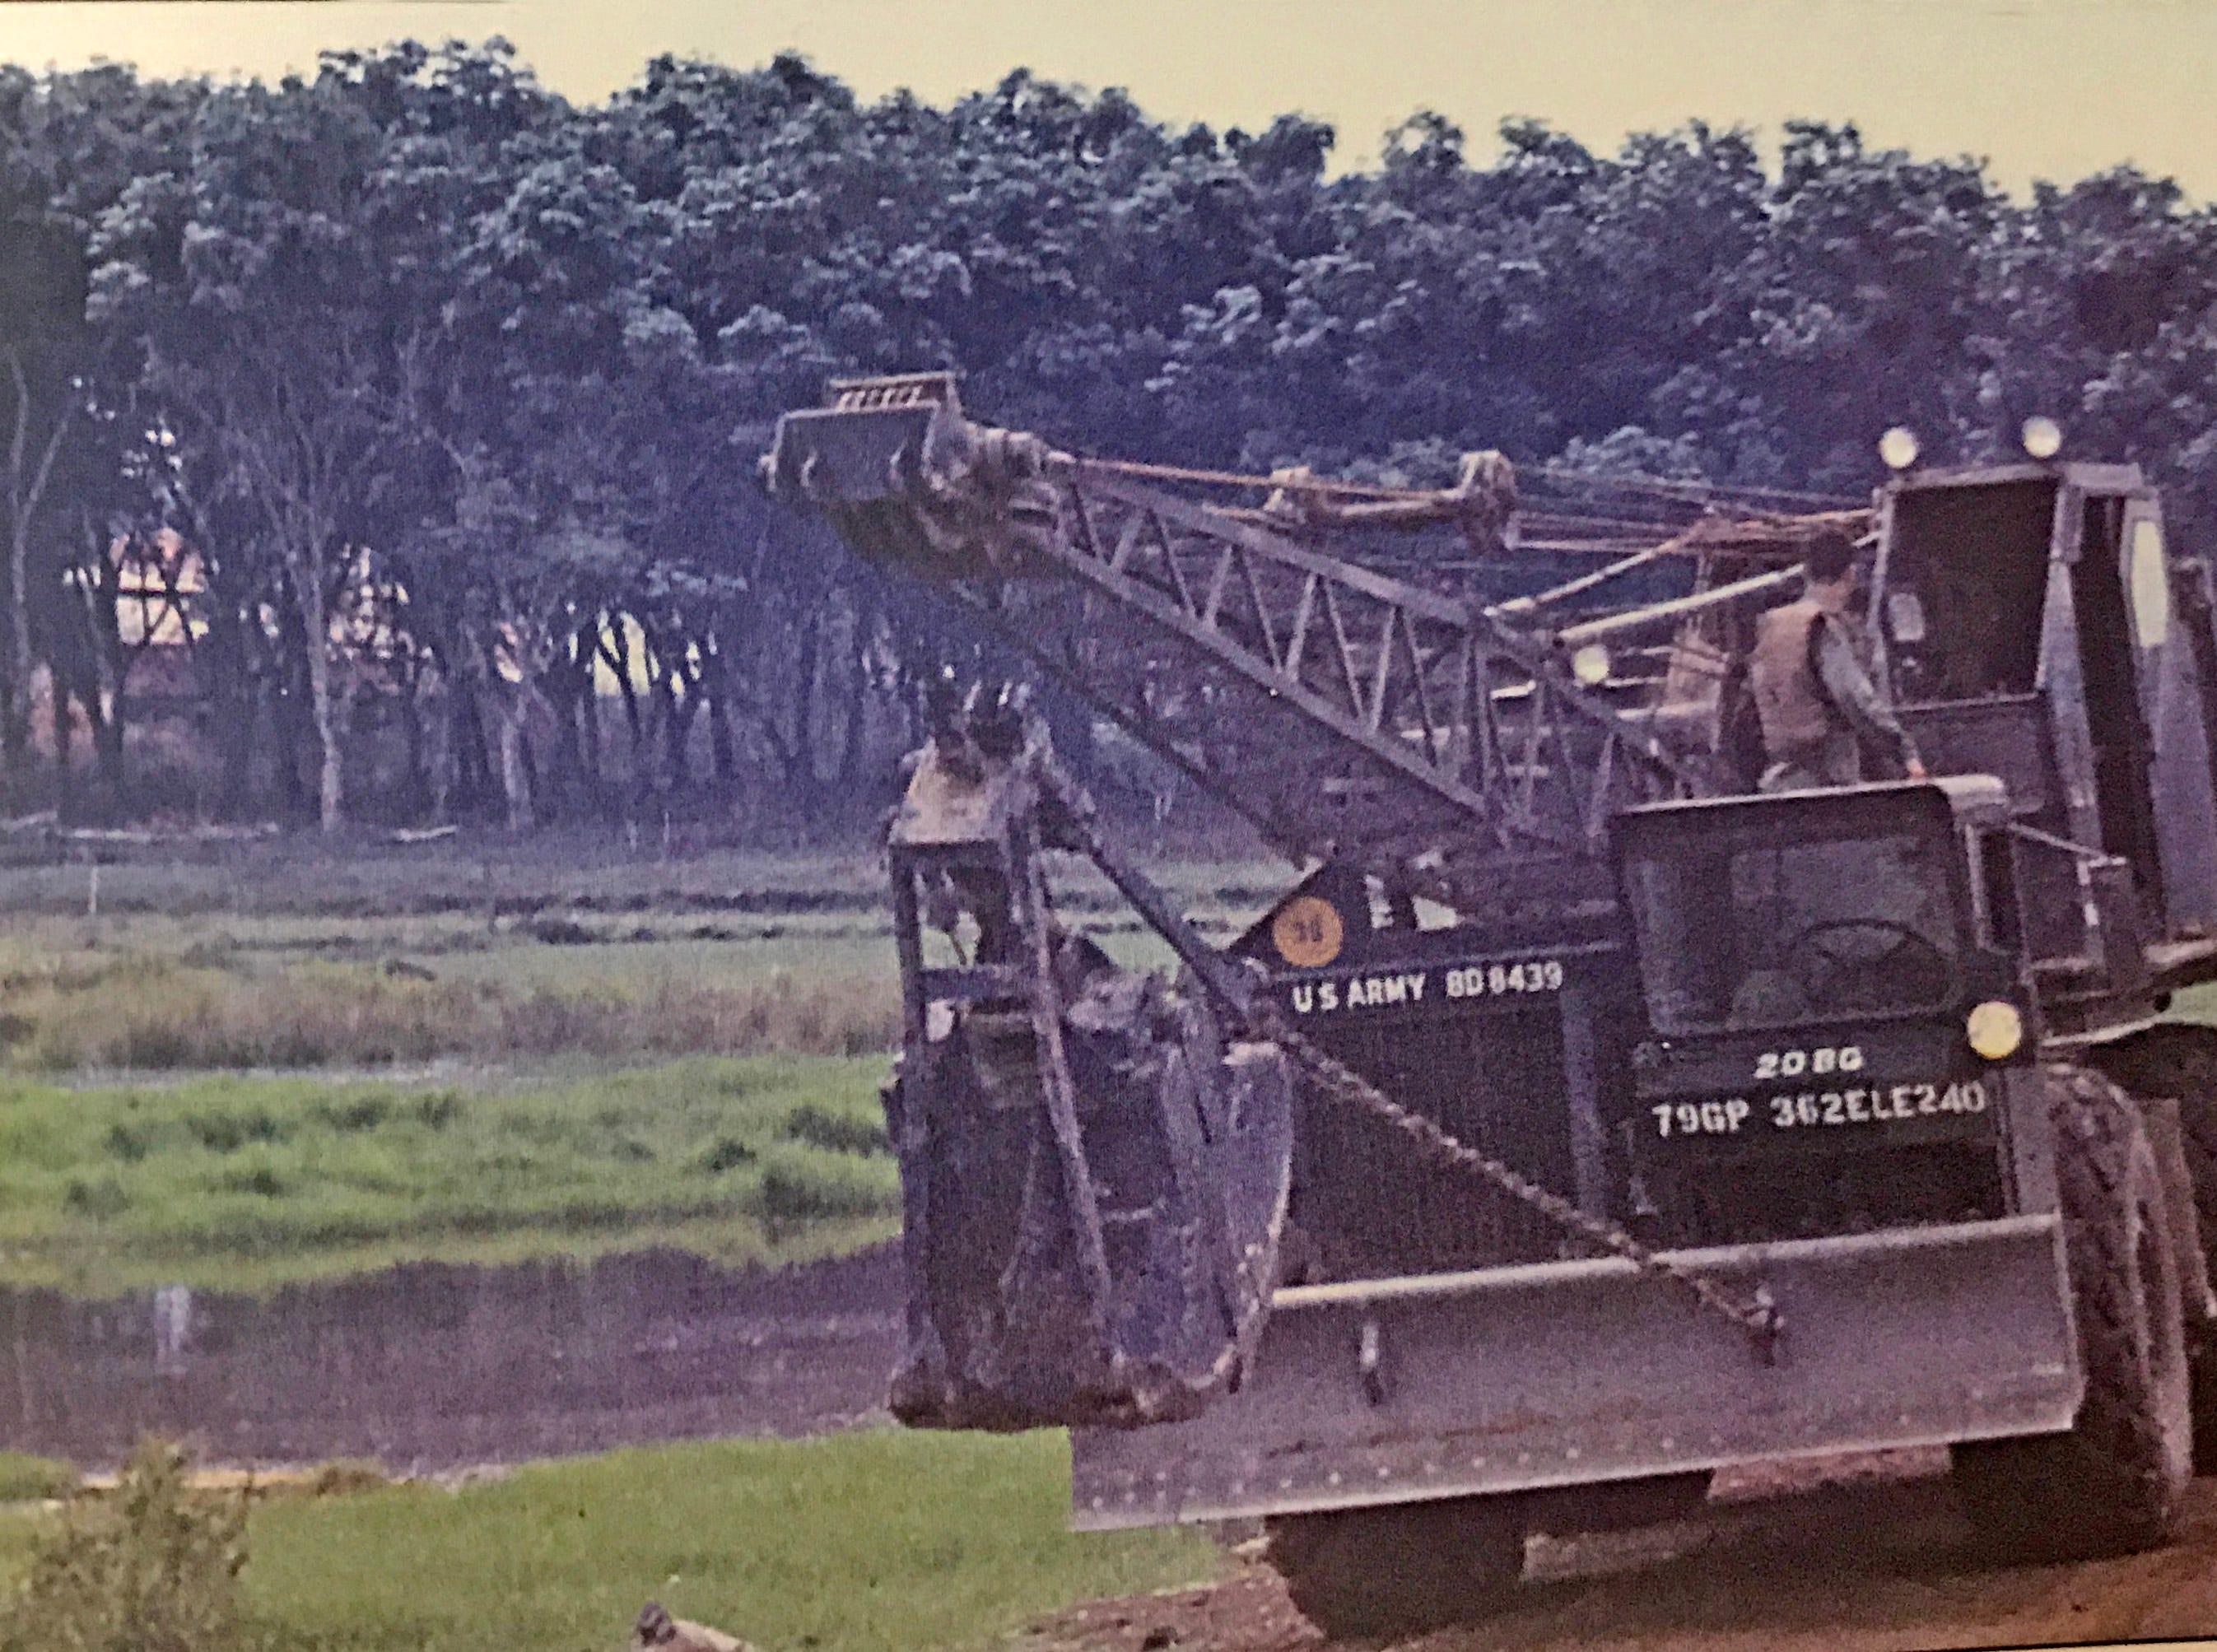 Lloyd and his crane in Vietnam.